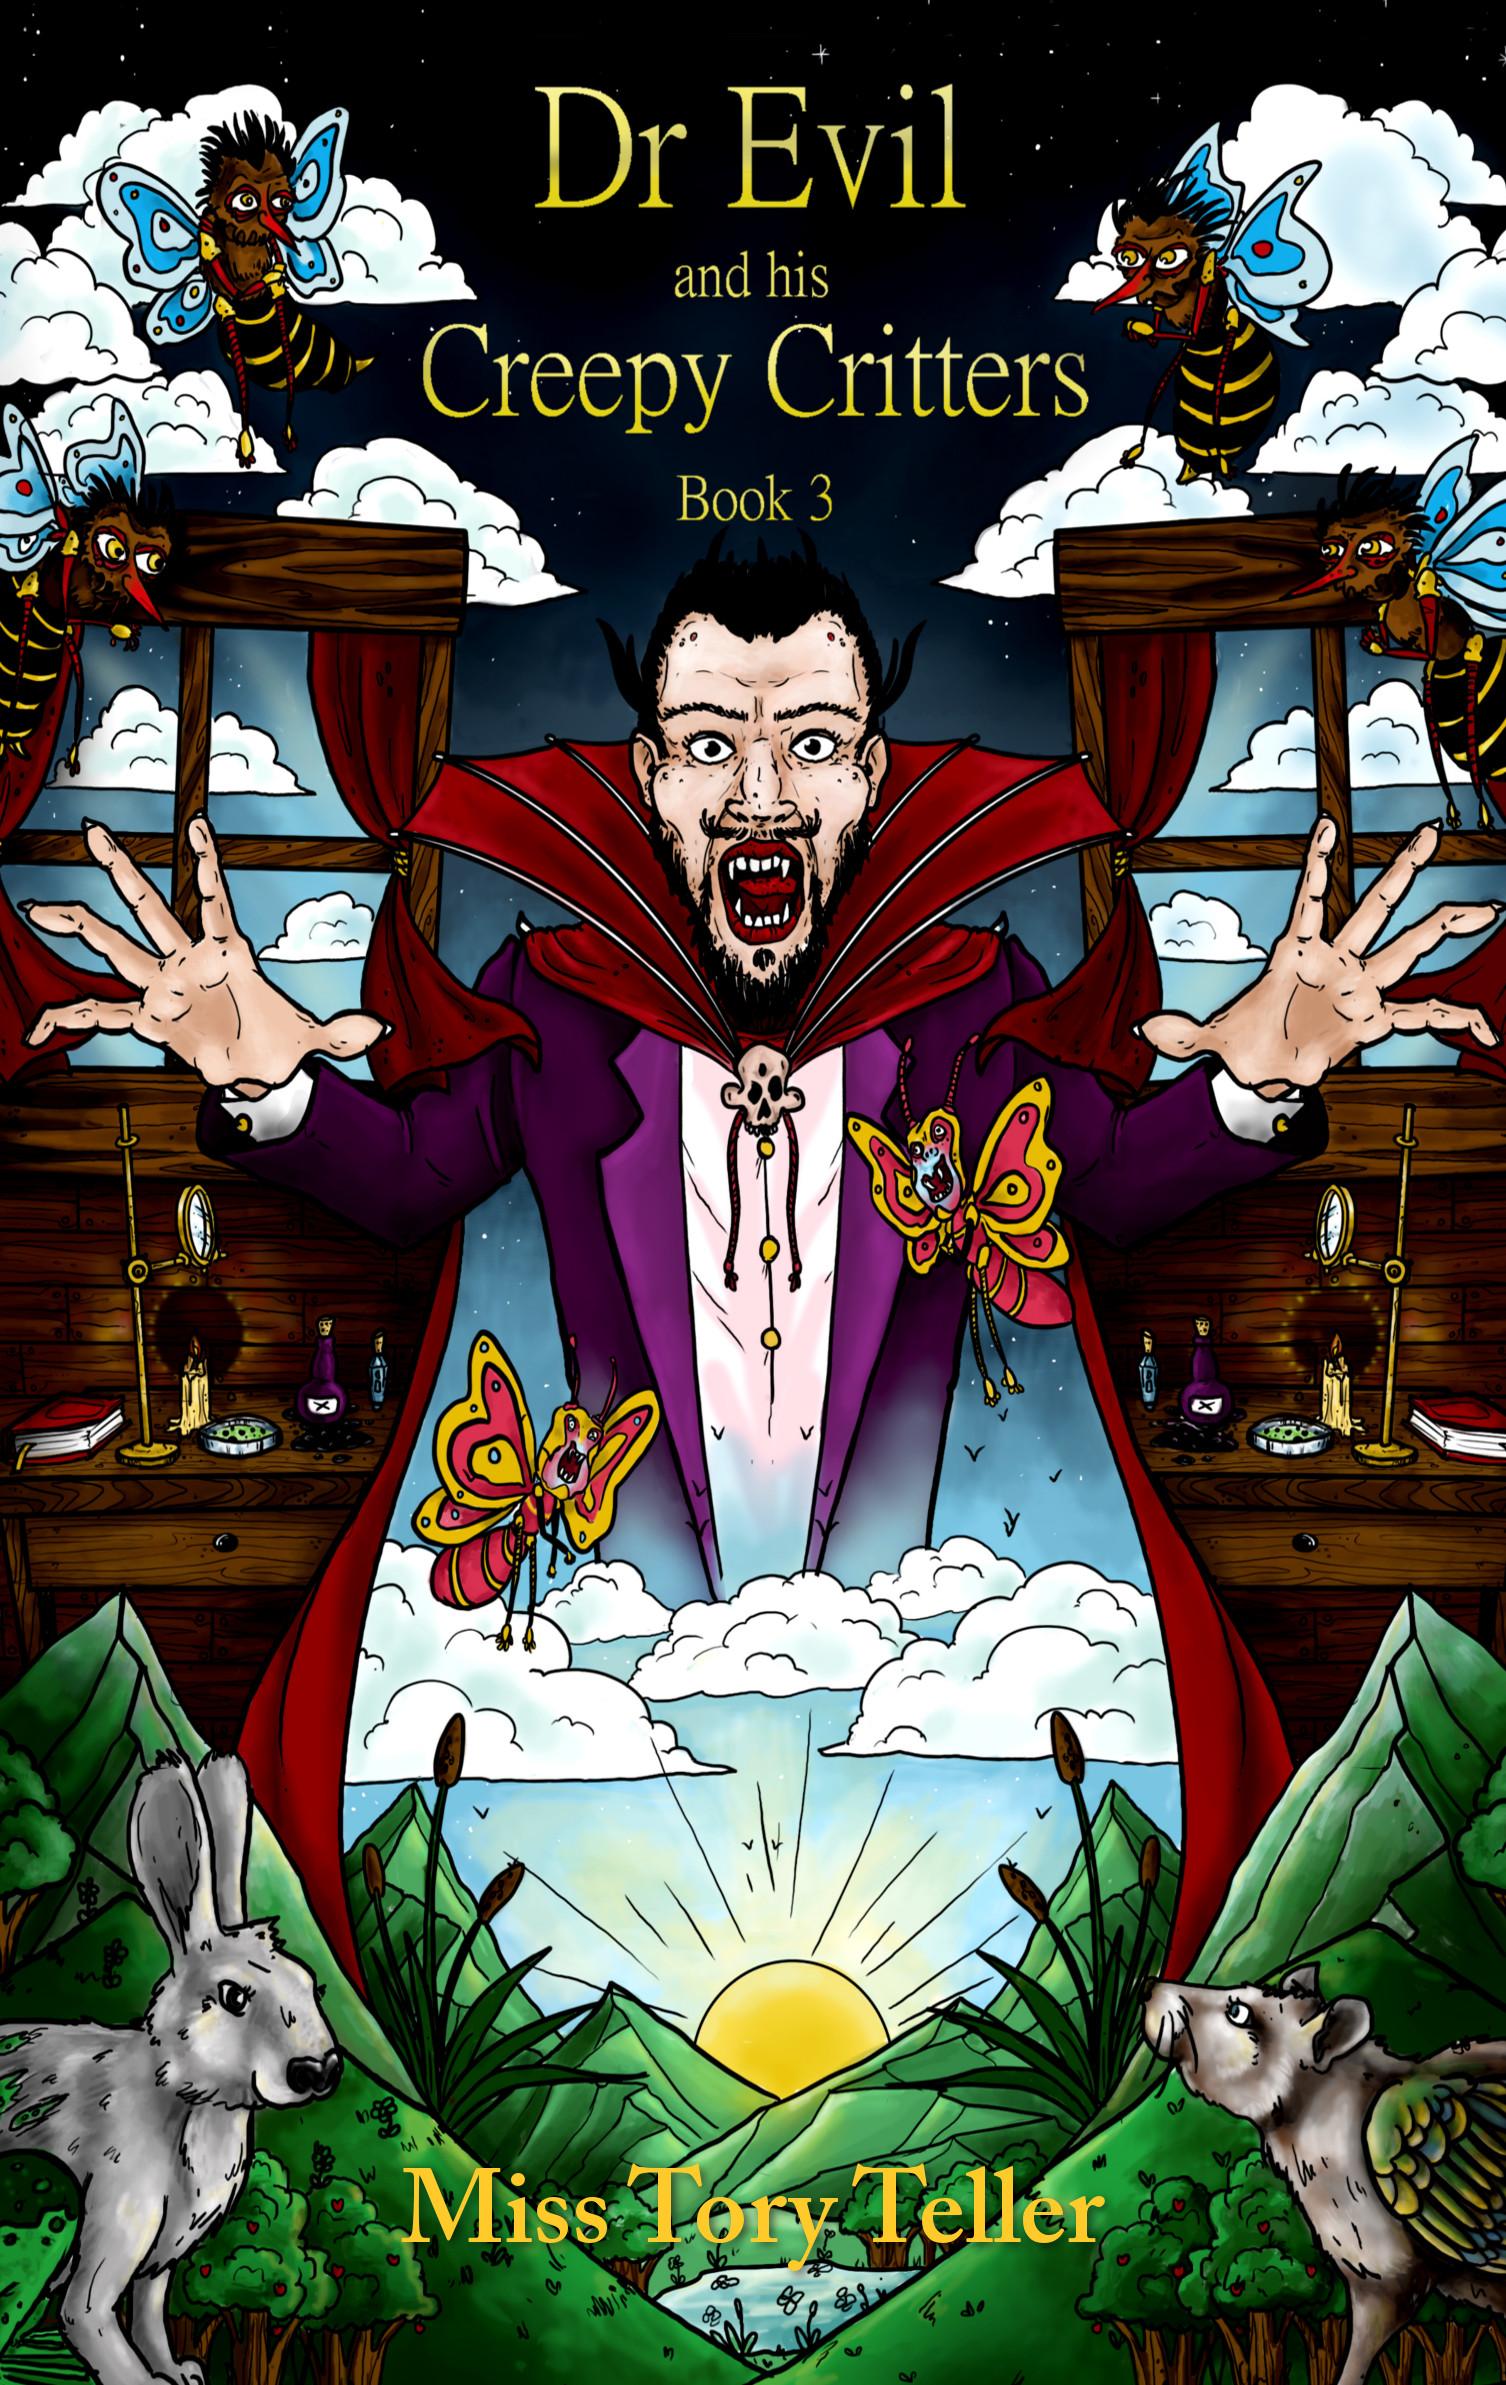 Dr Evil 3 ebook cover.jpg